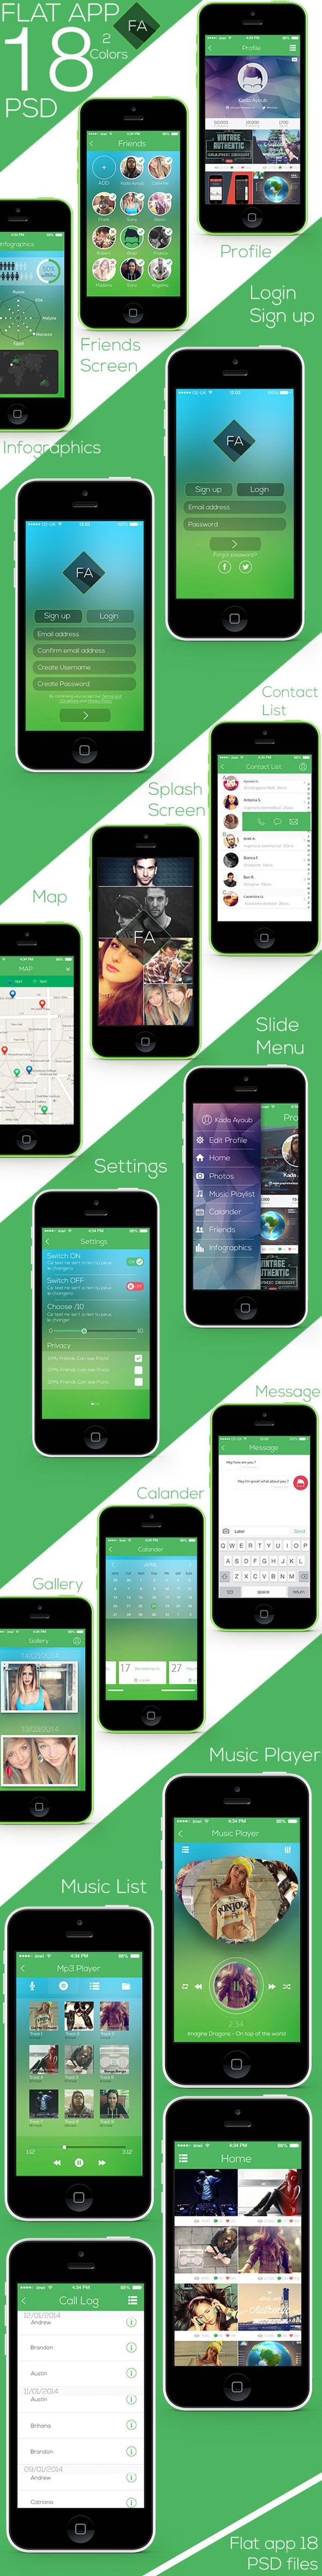 Flat-app-Ui-Full-Project-Free-Download